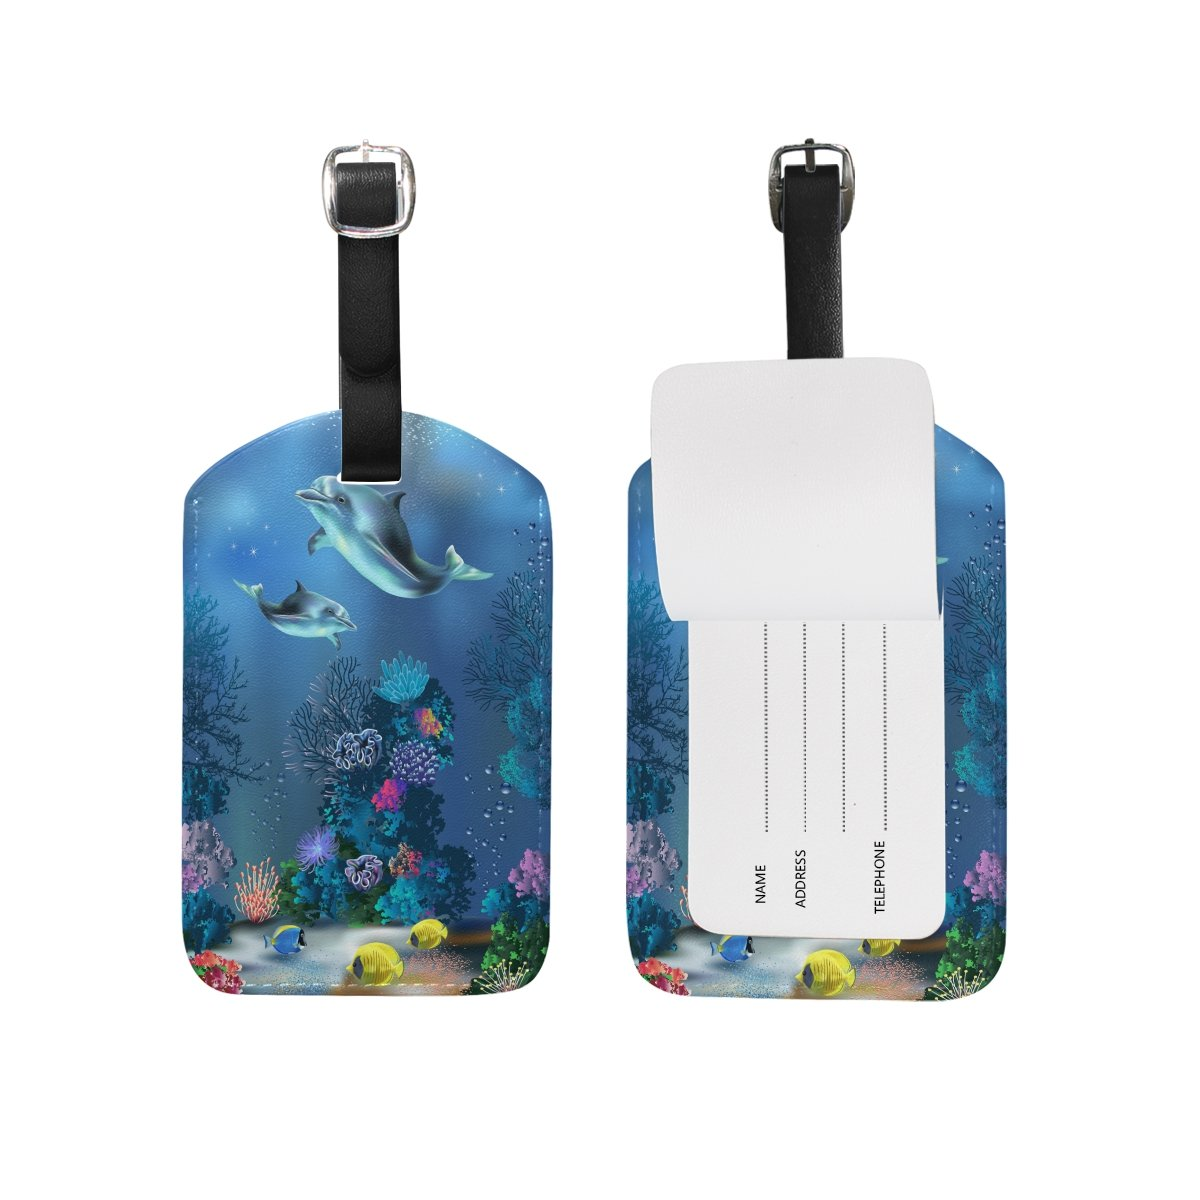 1Pcs Saobao Travel Luggage Tag Dolphin PU Leather Baggage Suitcase Travel ID Bag Tag